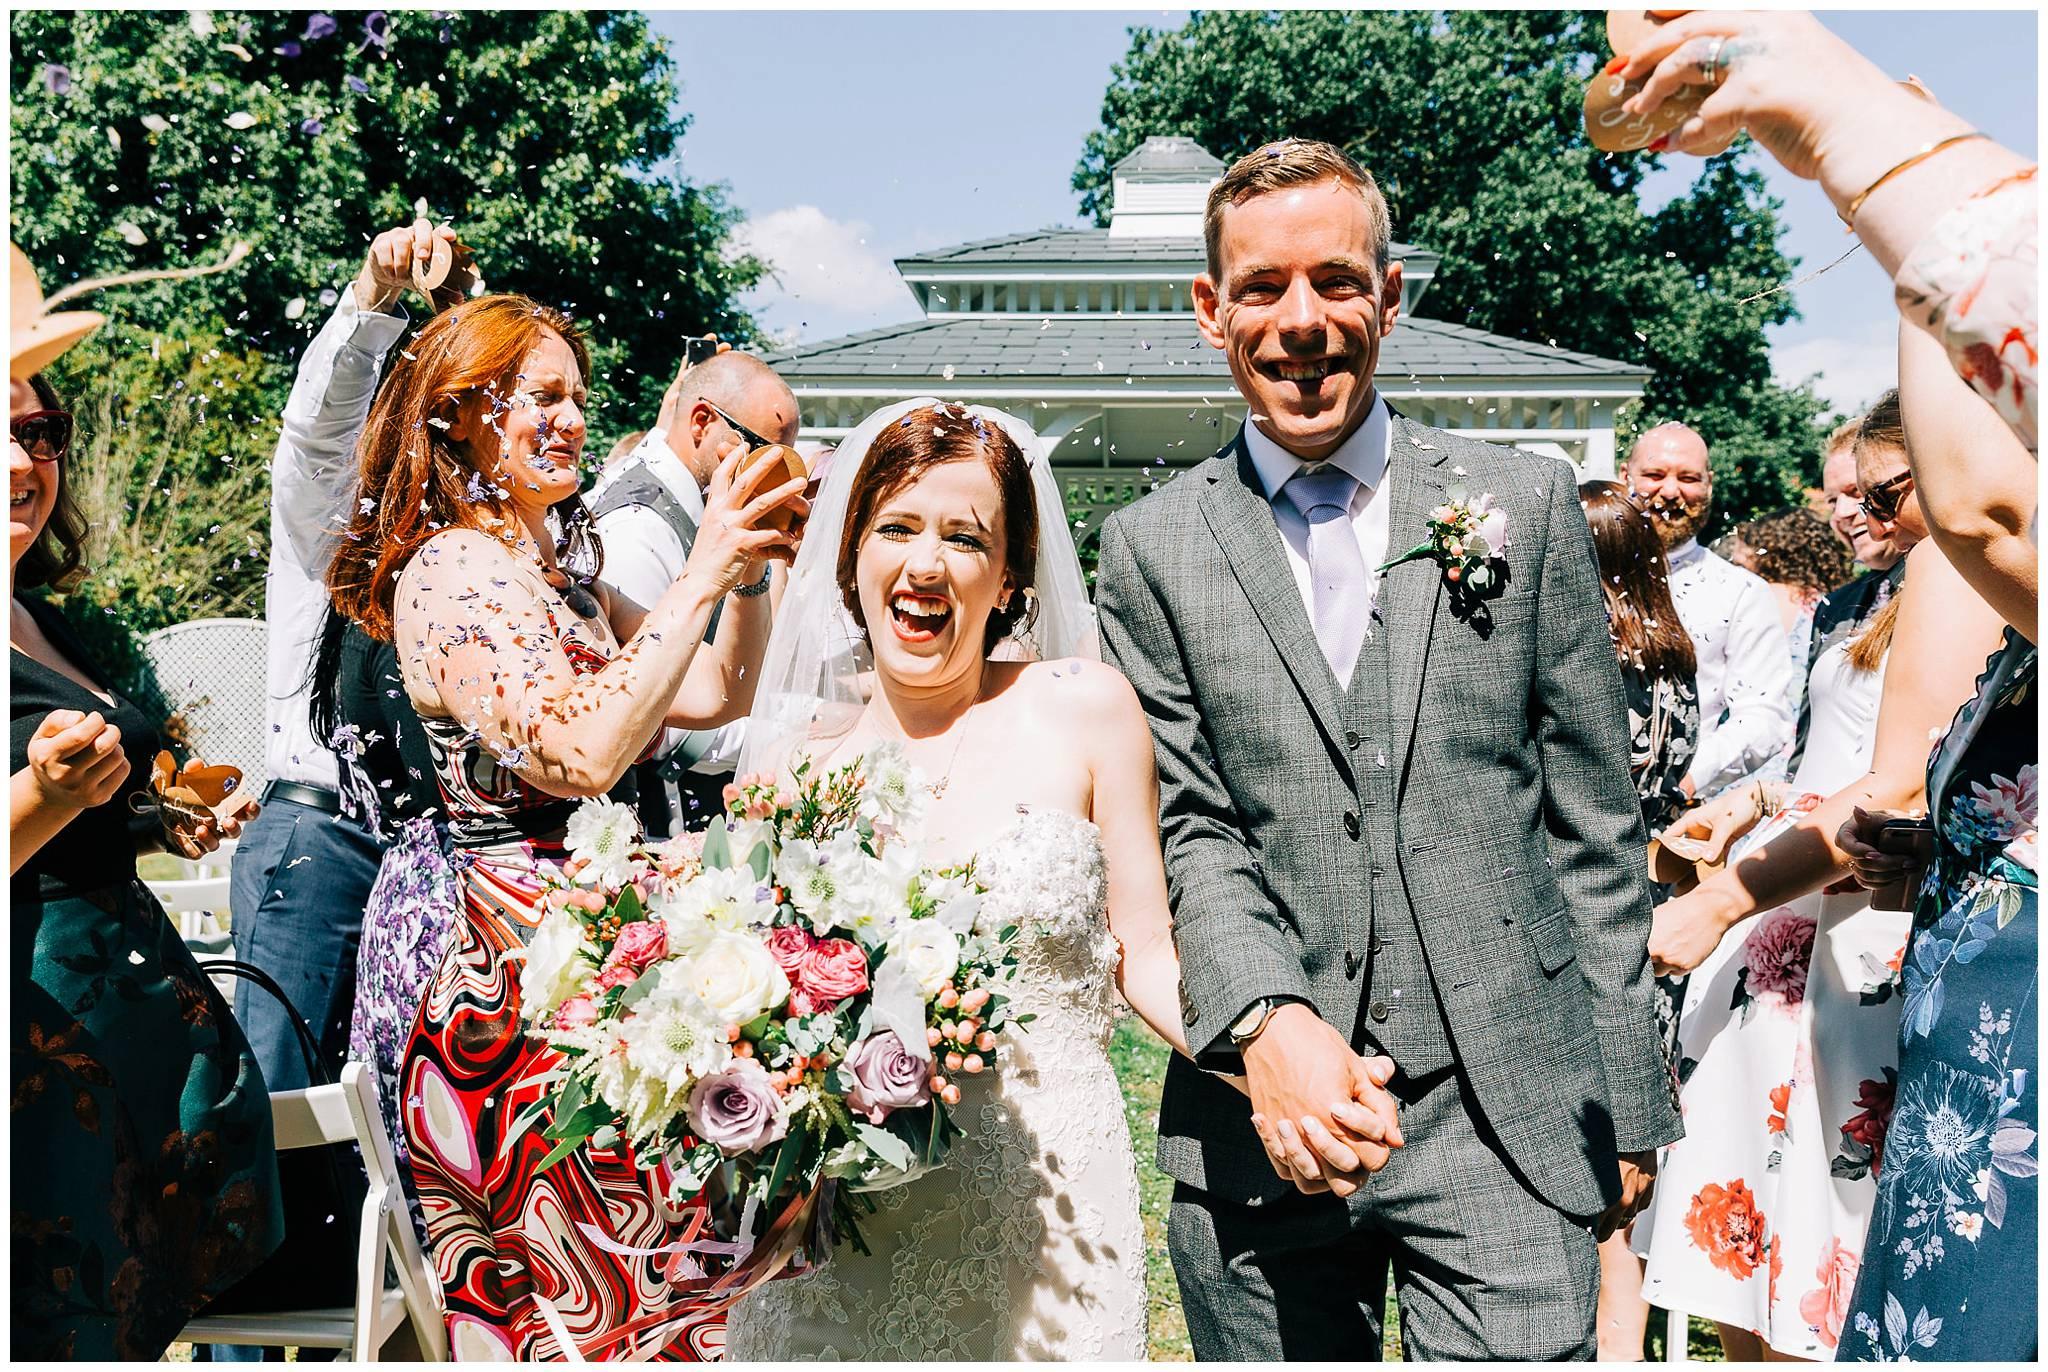 Summer Garden Wedding - The Old Vicarage Boutique Hotel47.jpg